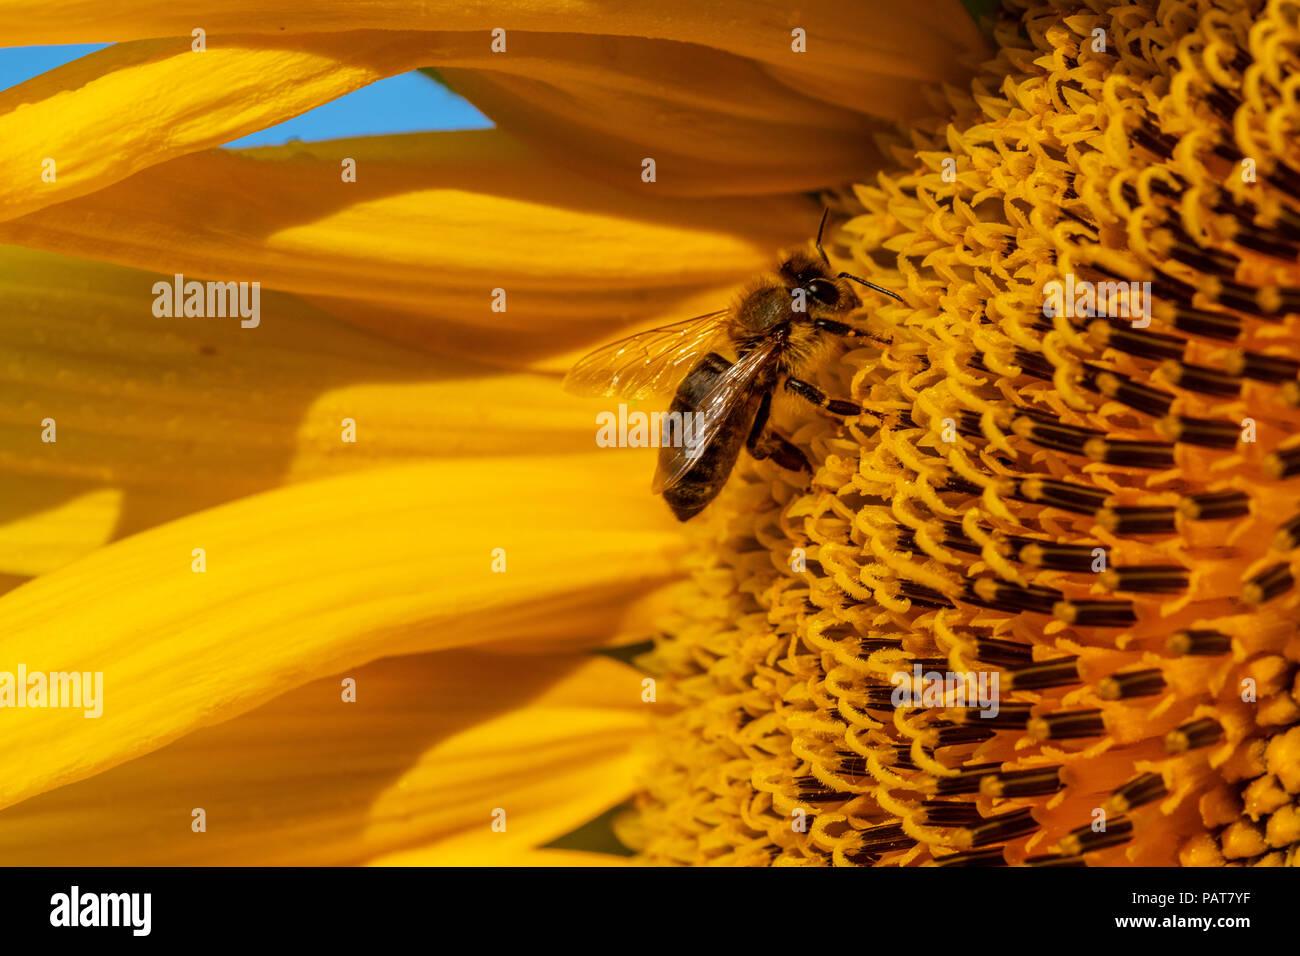 Honey Bee on Sunflower, close up - Stock Image